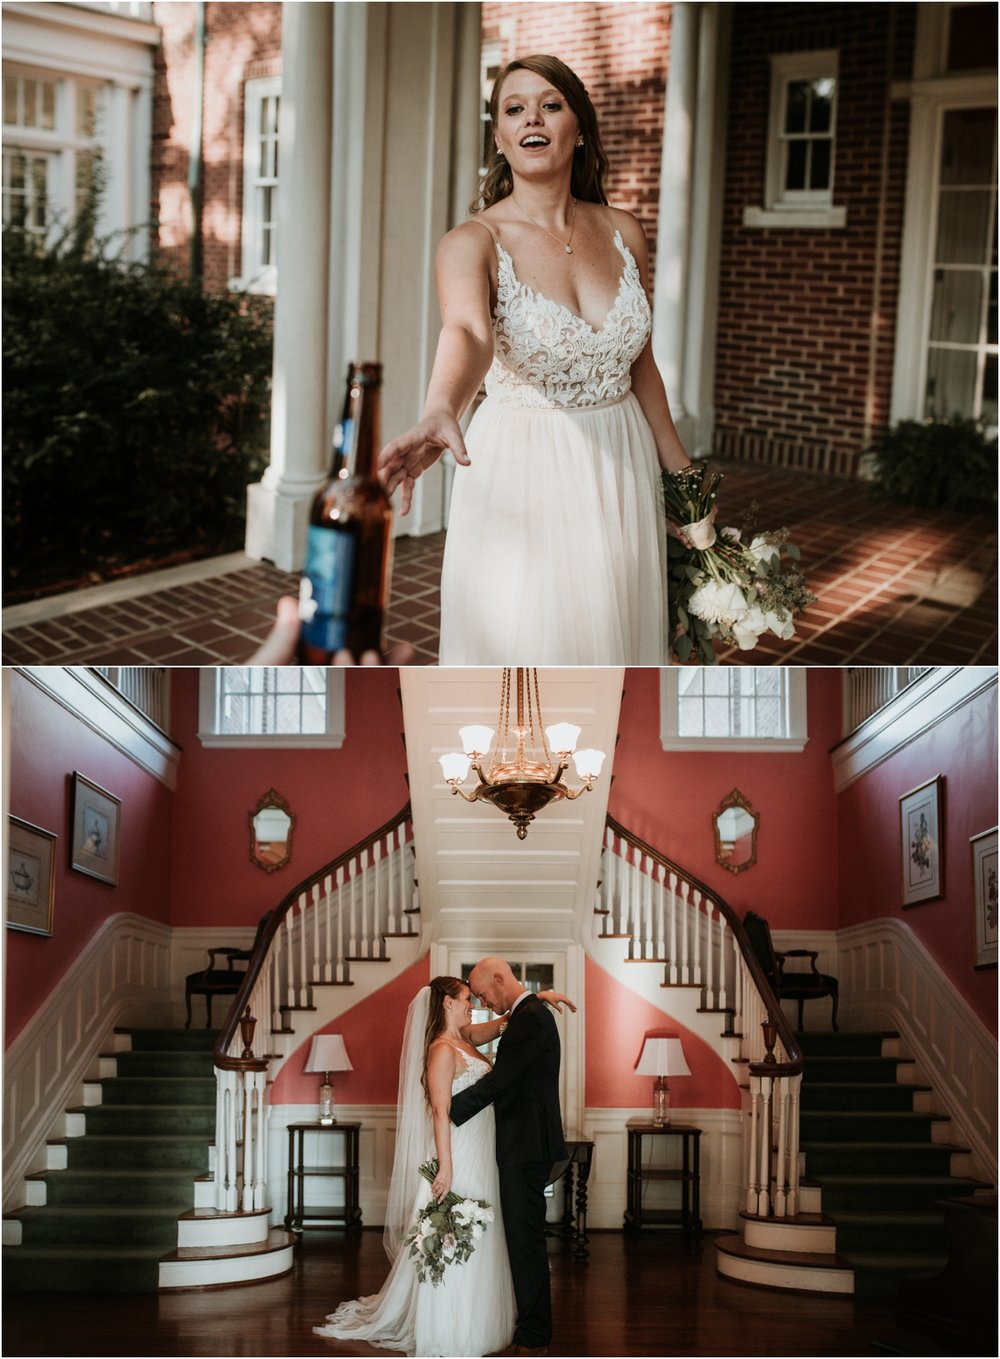 Stowe-manor-wedding-belmont-nc_0048.jpg